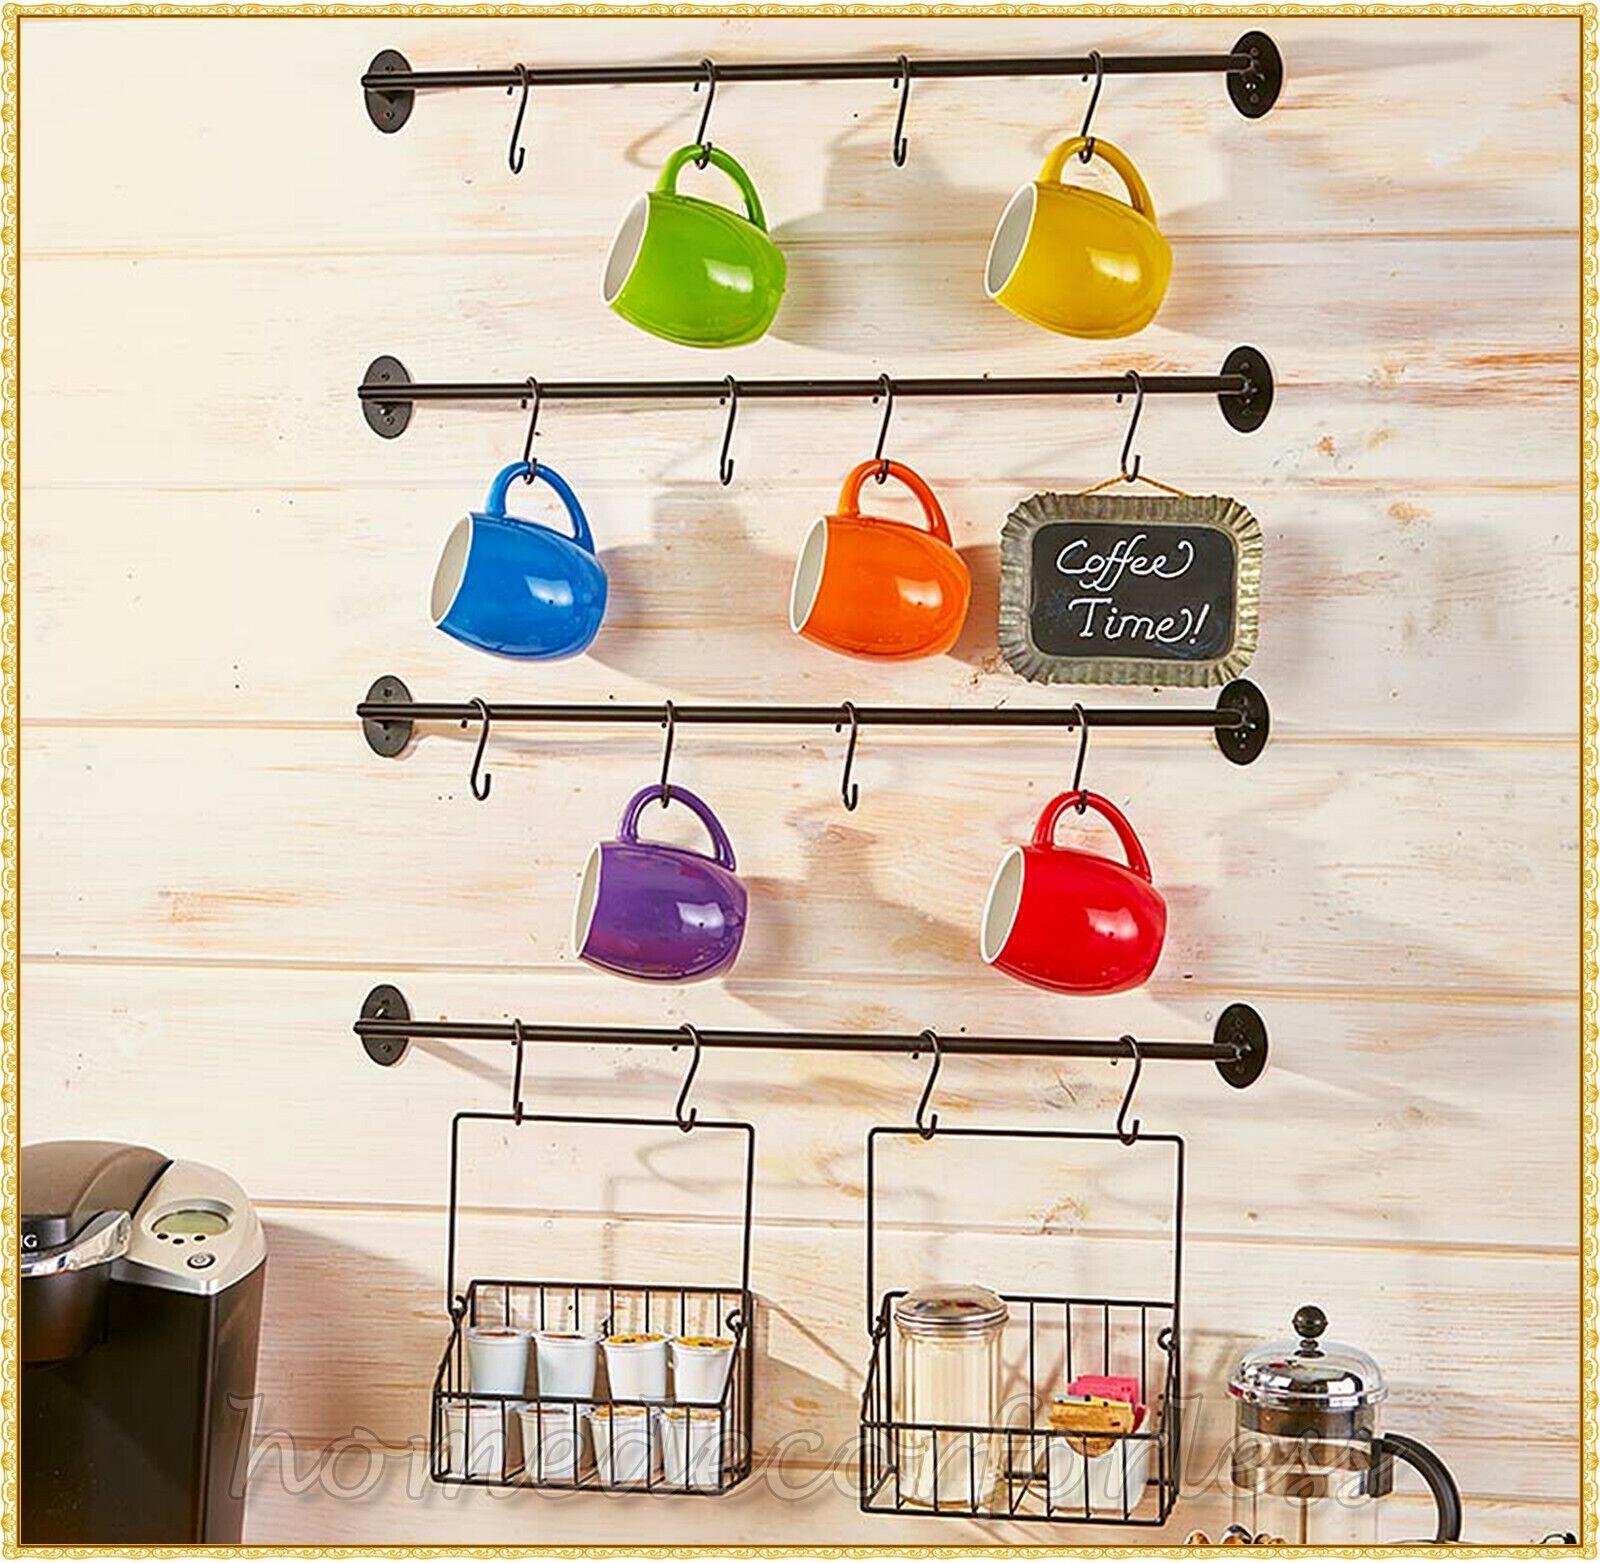 6 Pc Wall Mounted Coffee Mug K Cup Rack Basket Storage Set Kitchen Home Decor For Sale Online Ebay